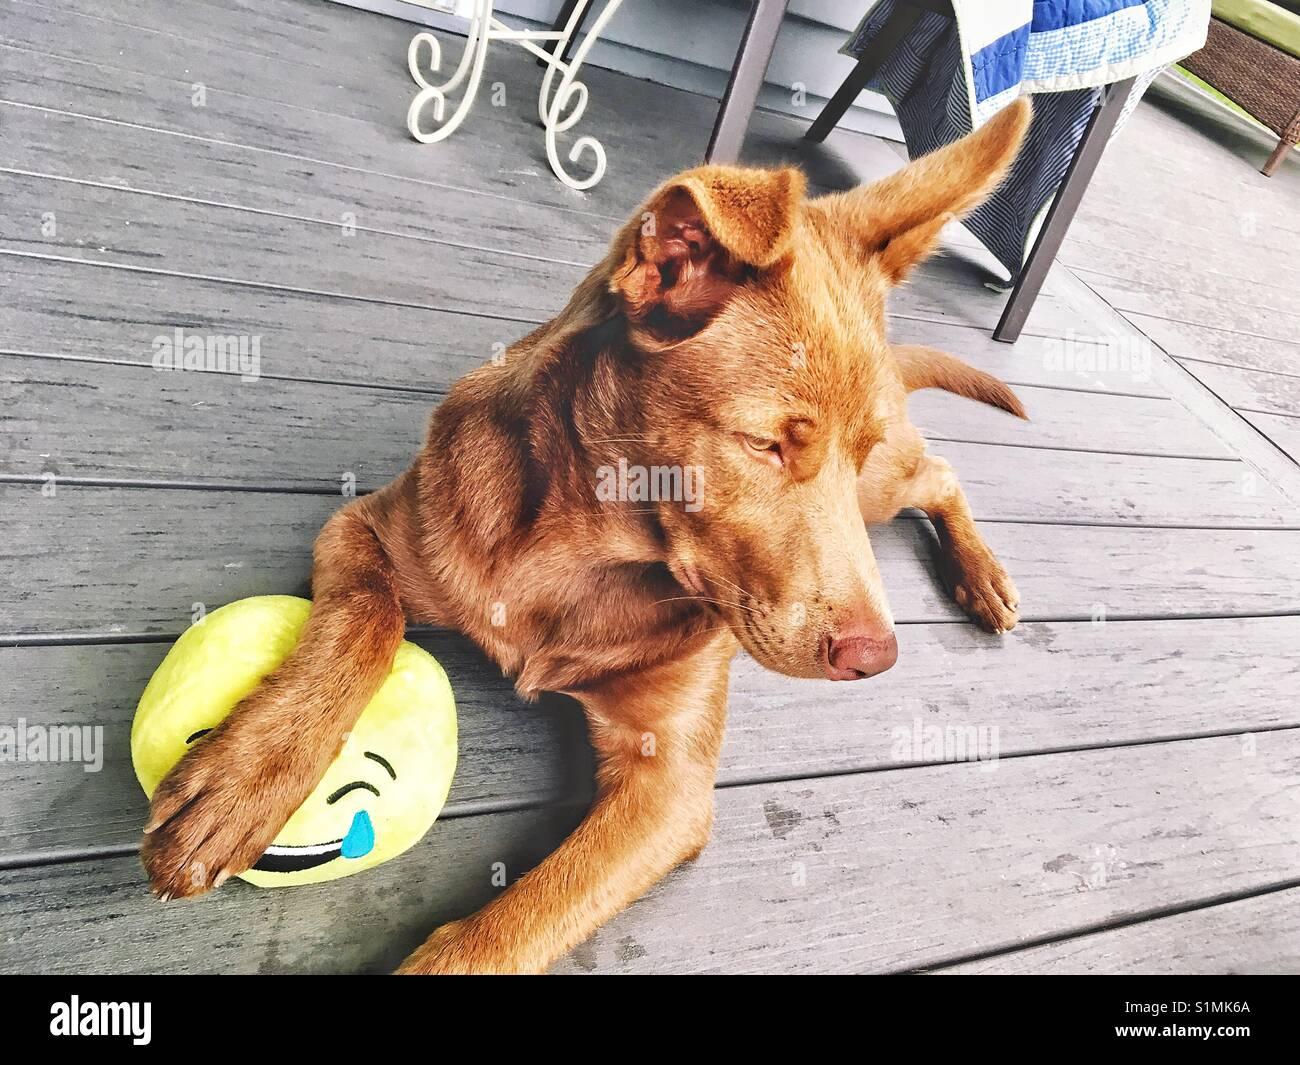 Dog at the porch - Stock Image